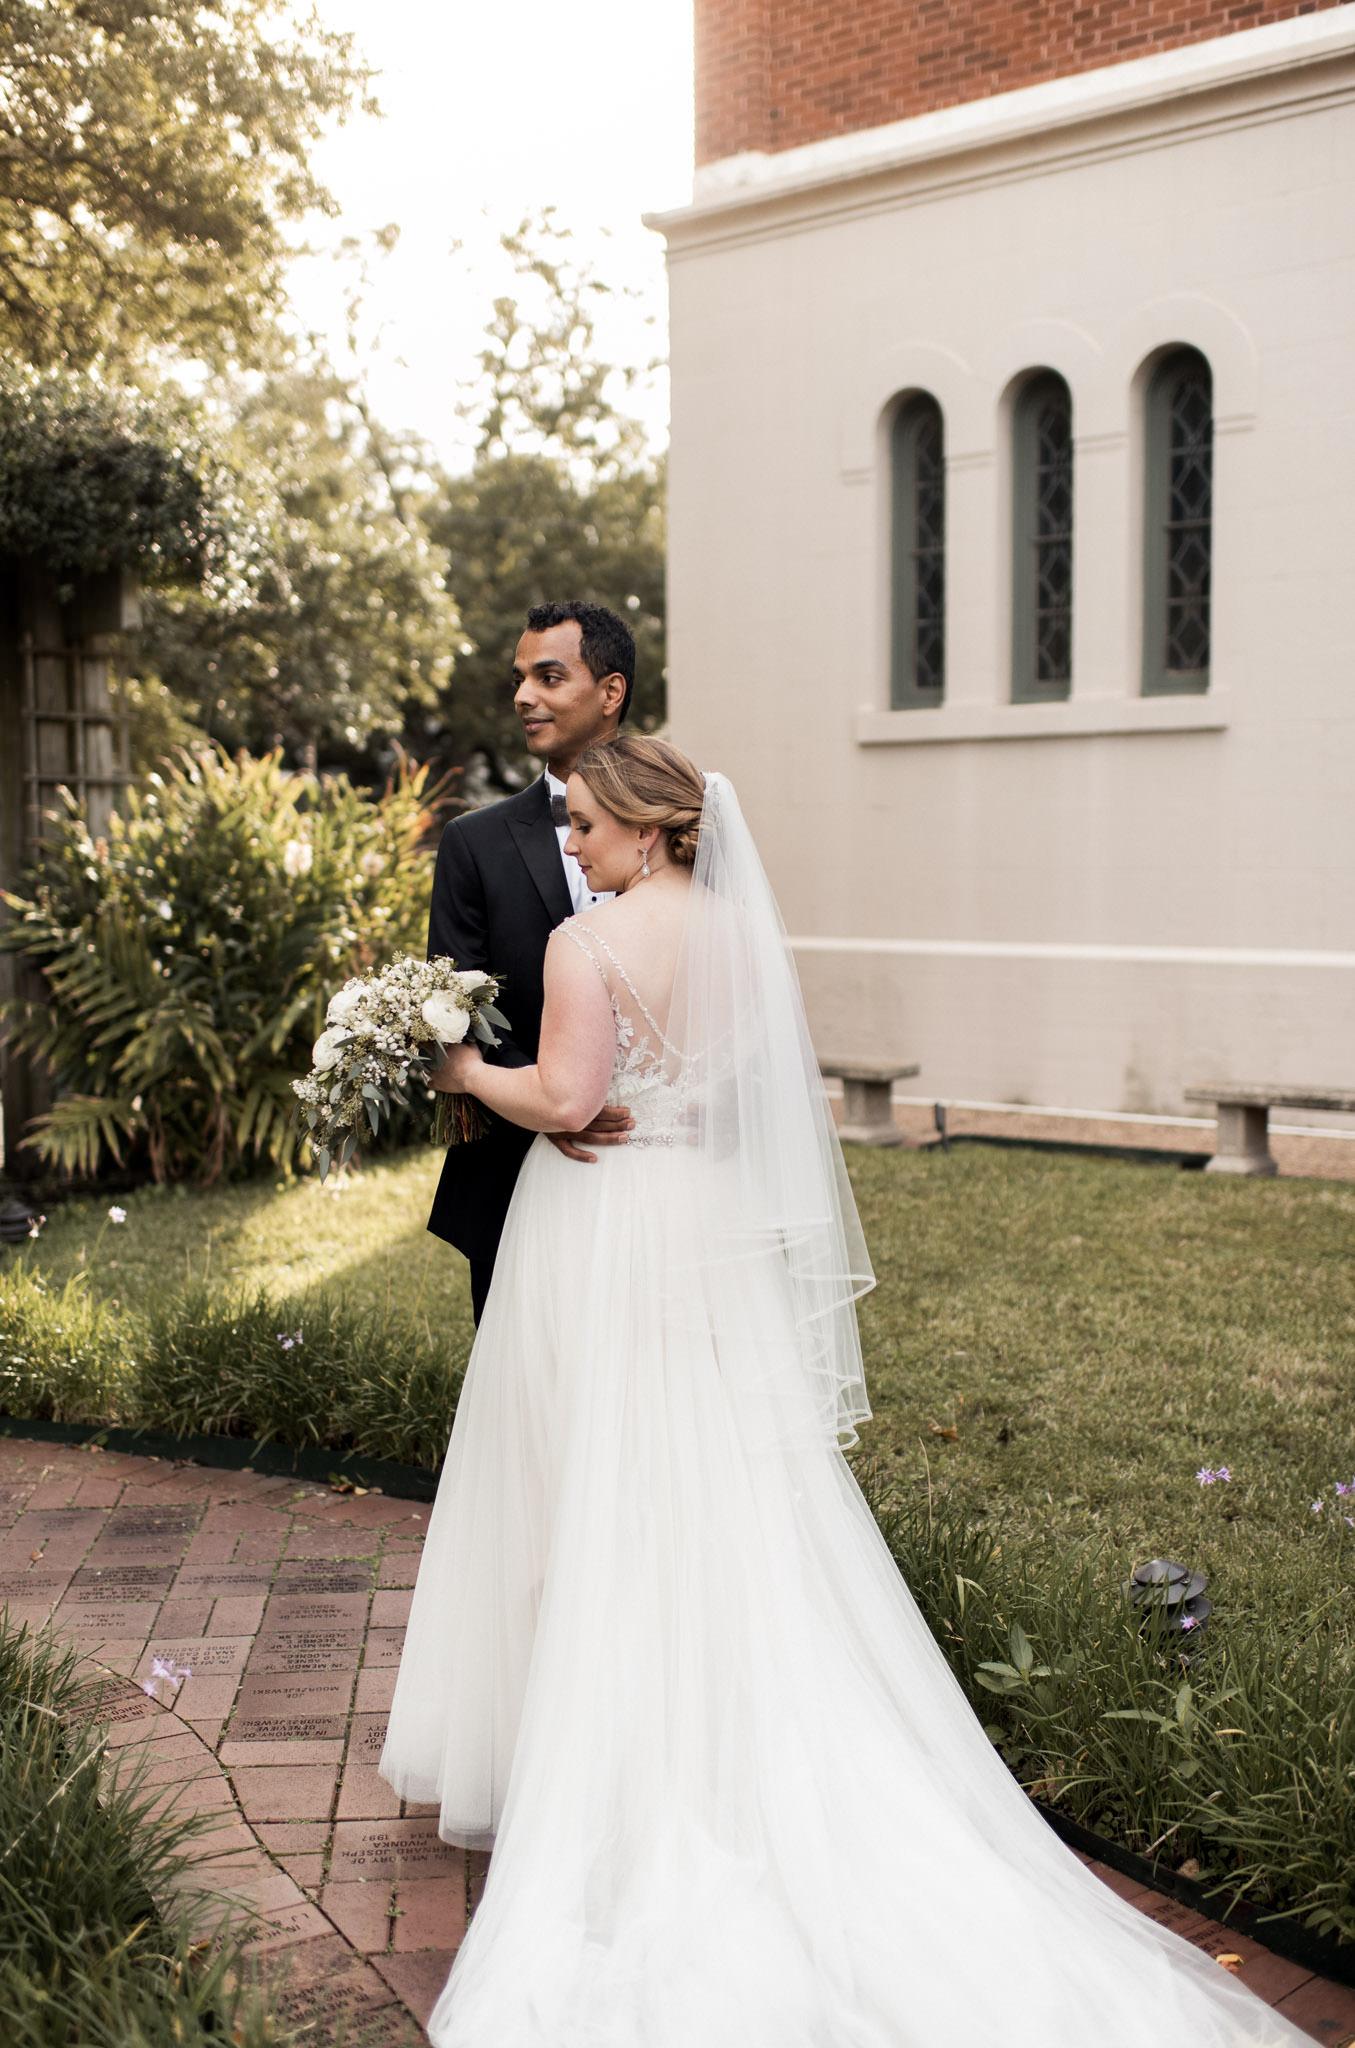 nicole-fellipe-wedding-sm-19.jpg